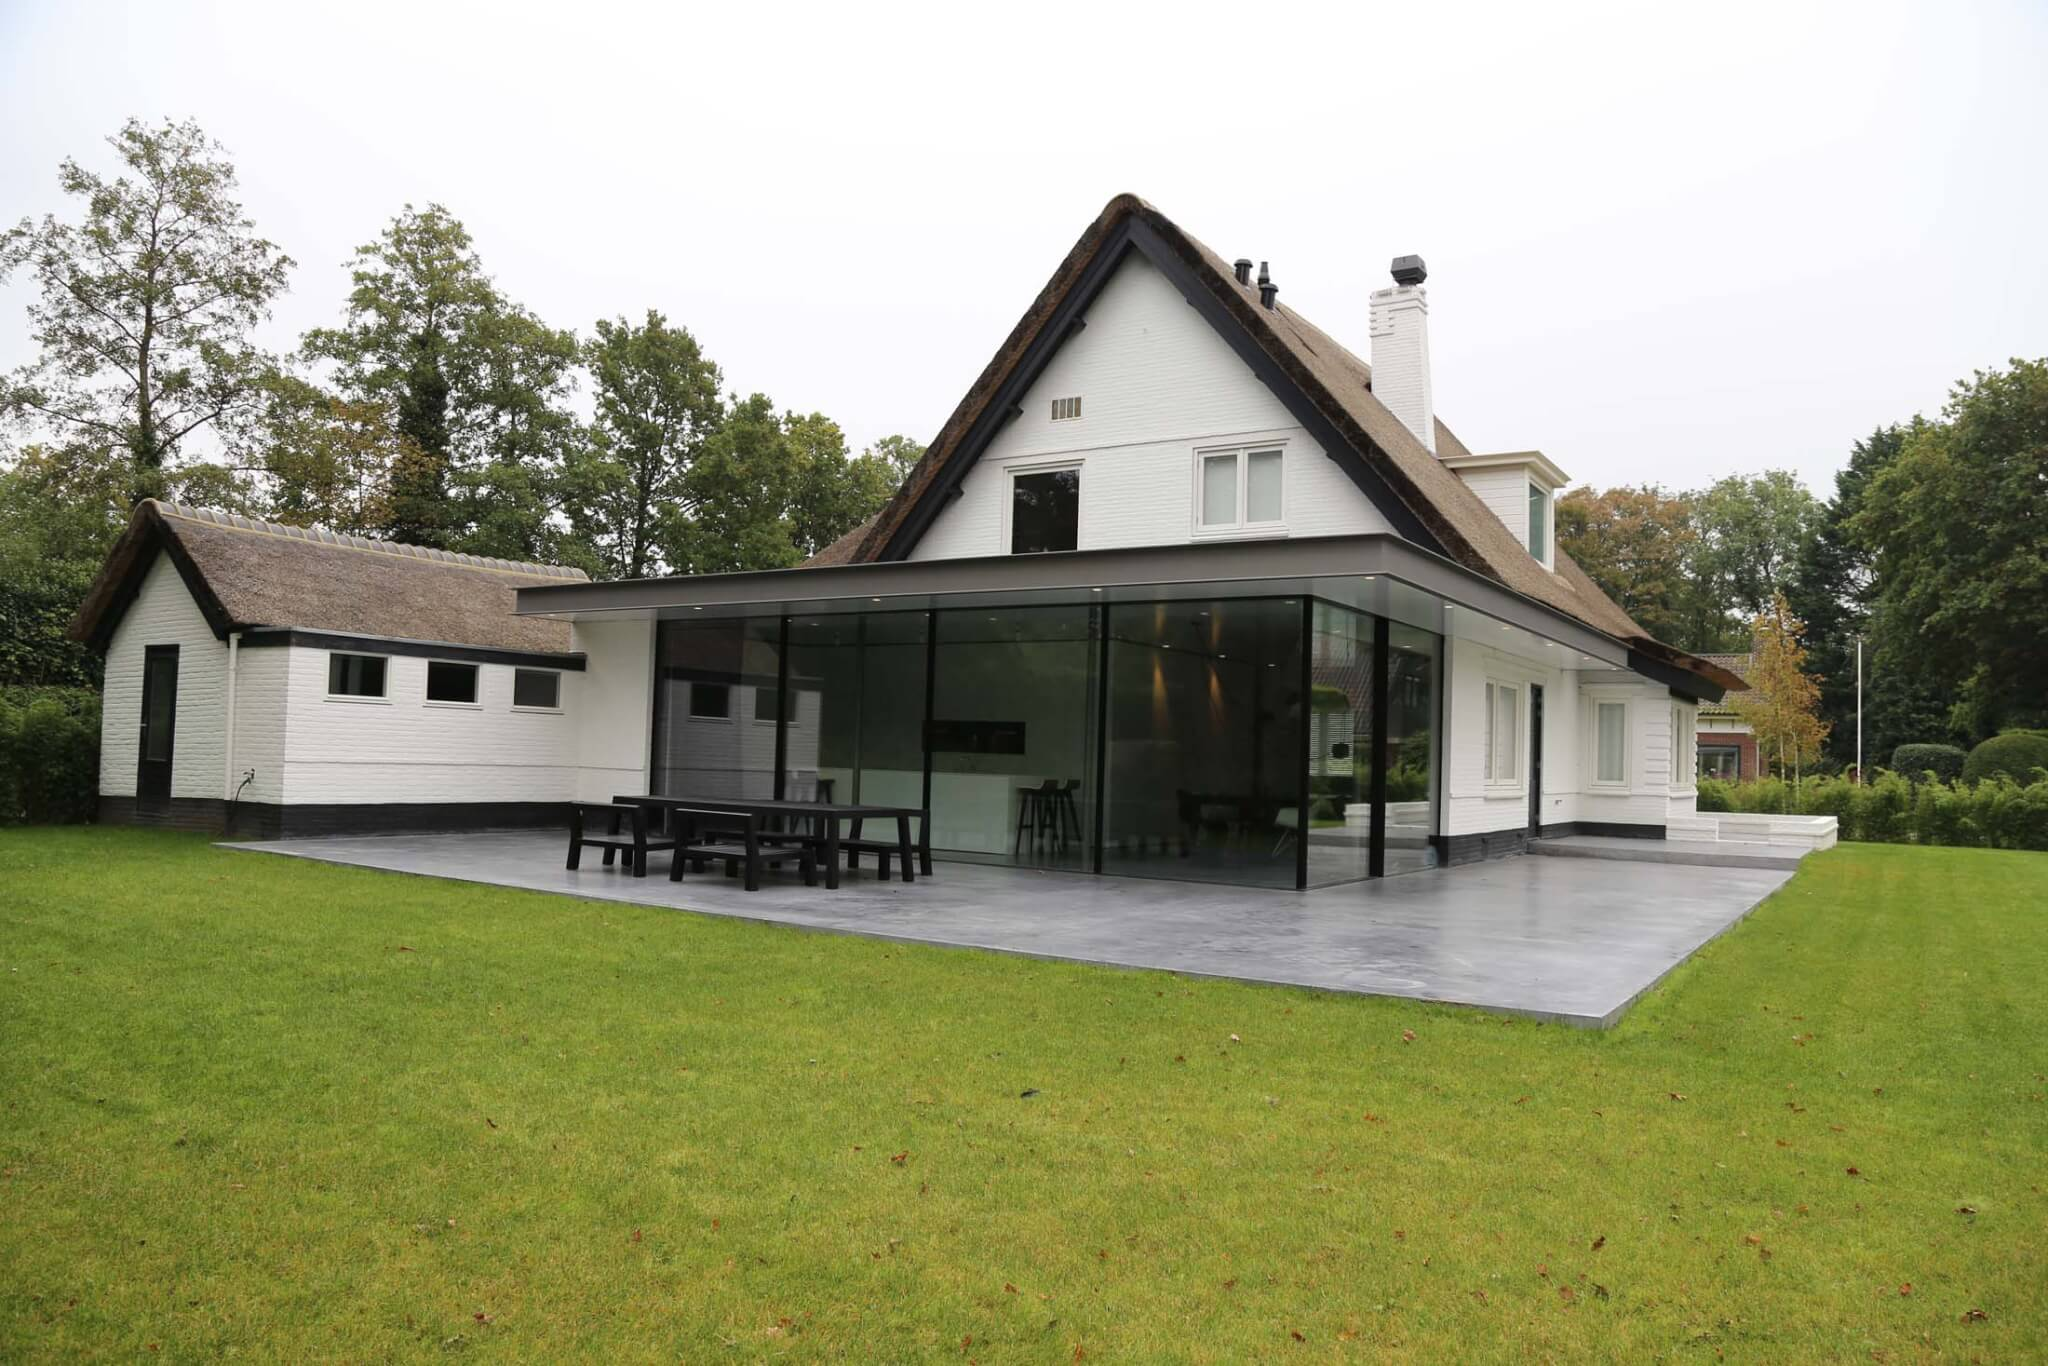 Home slide 2